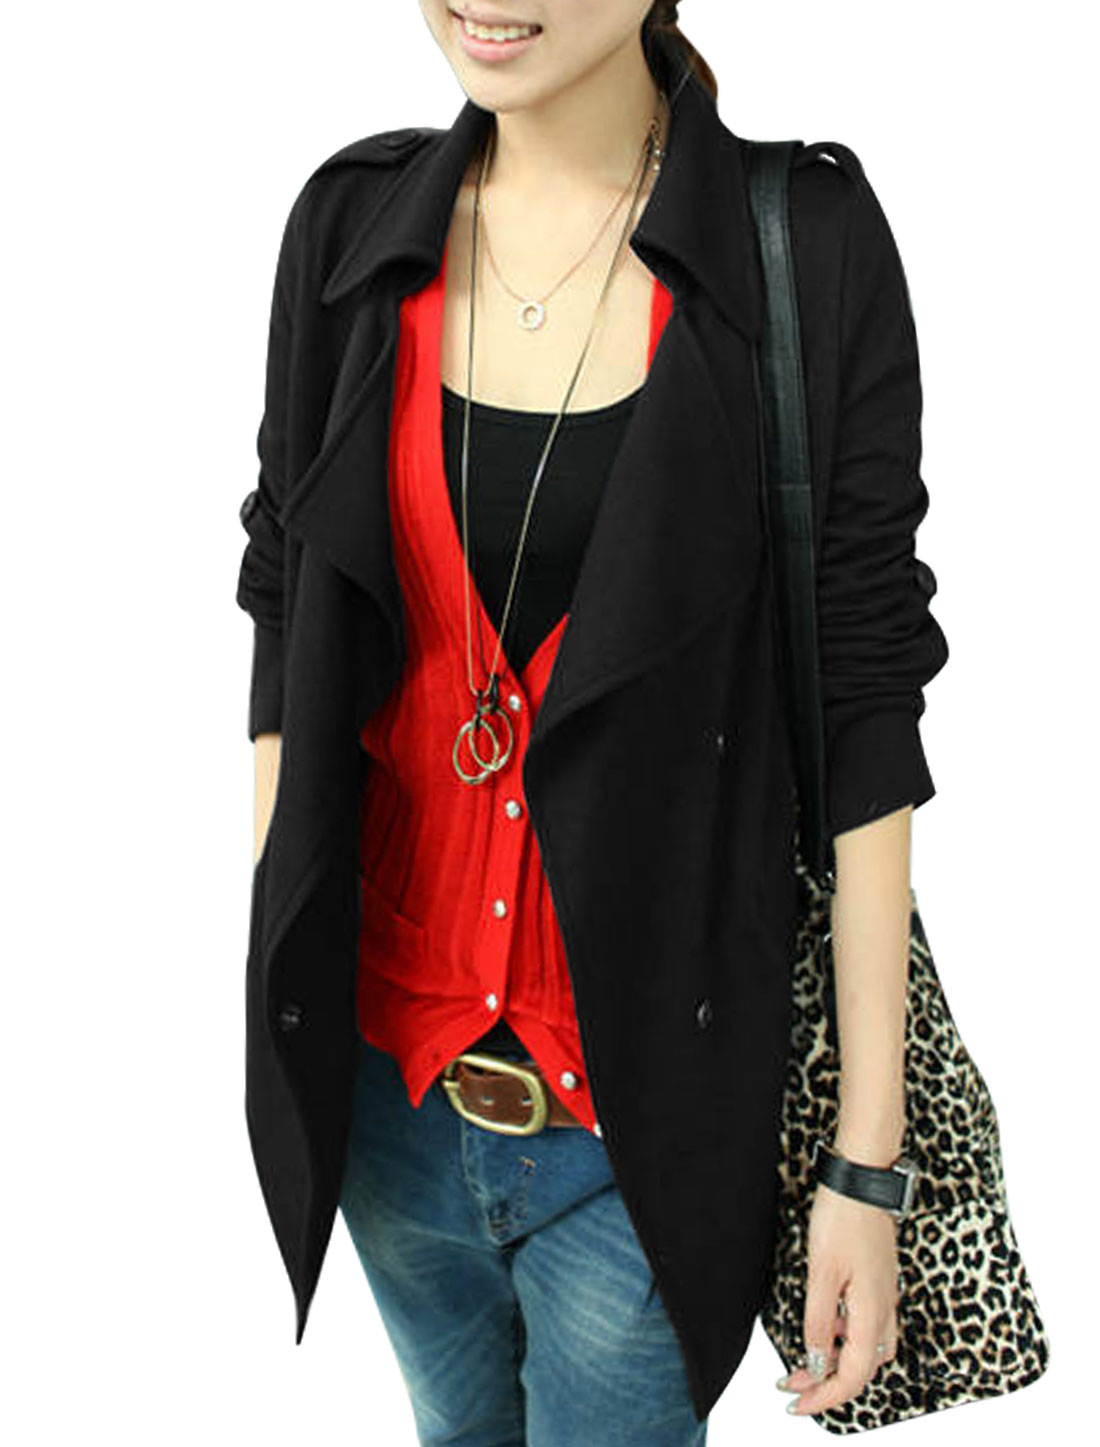 Ladies Black Split Neck Full Sleeves Hidden Single Breasted Button Shoulder Blazer Jacket S